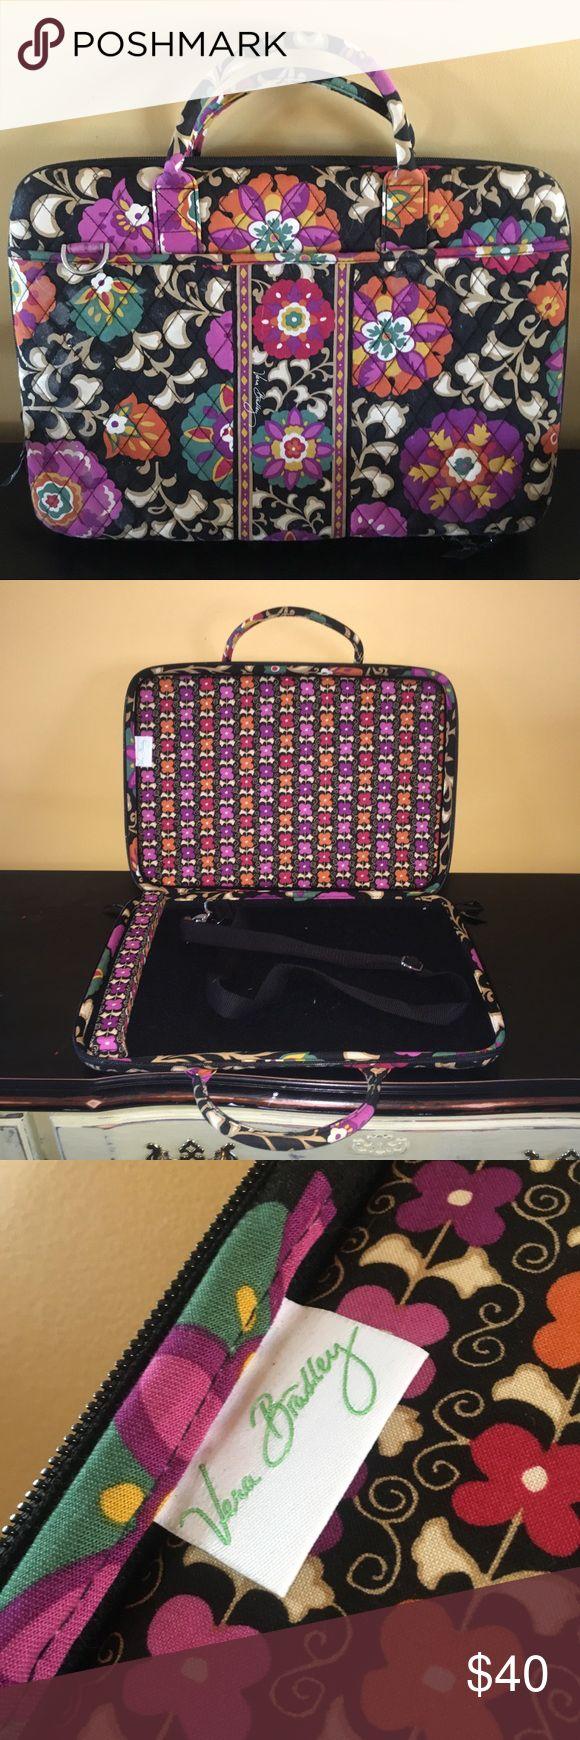 Vera Bradley laptop case MINT condition Vera Bradley laptop case. Includes all original straps. Vera Bradley Bags